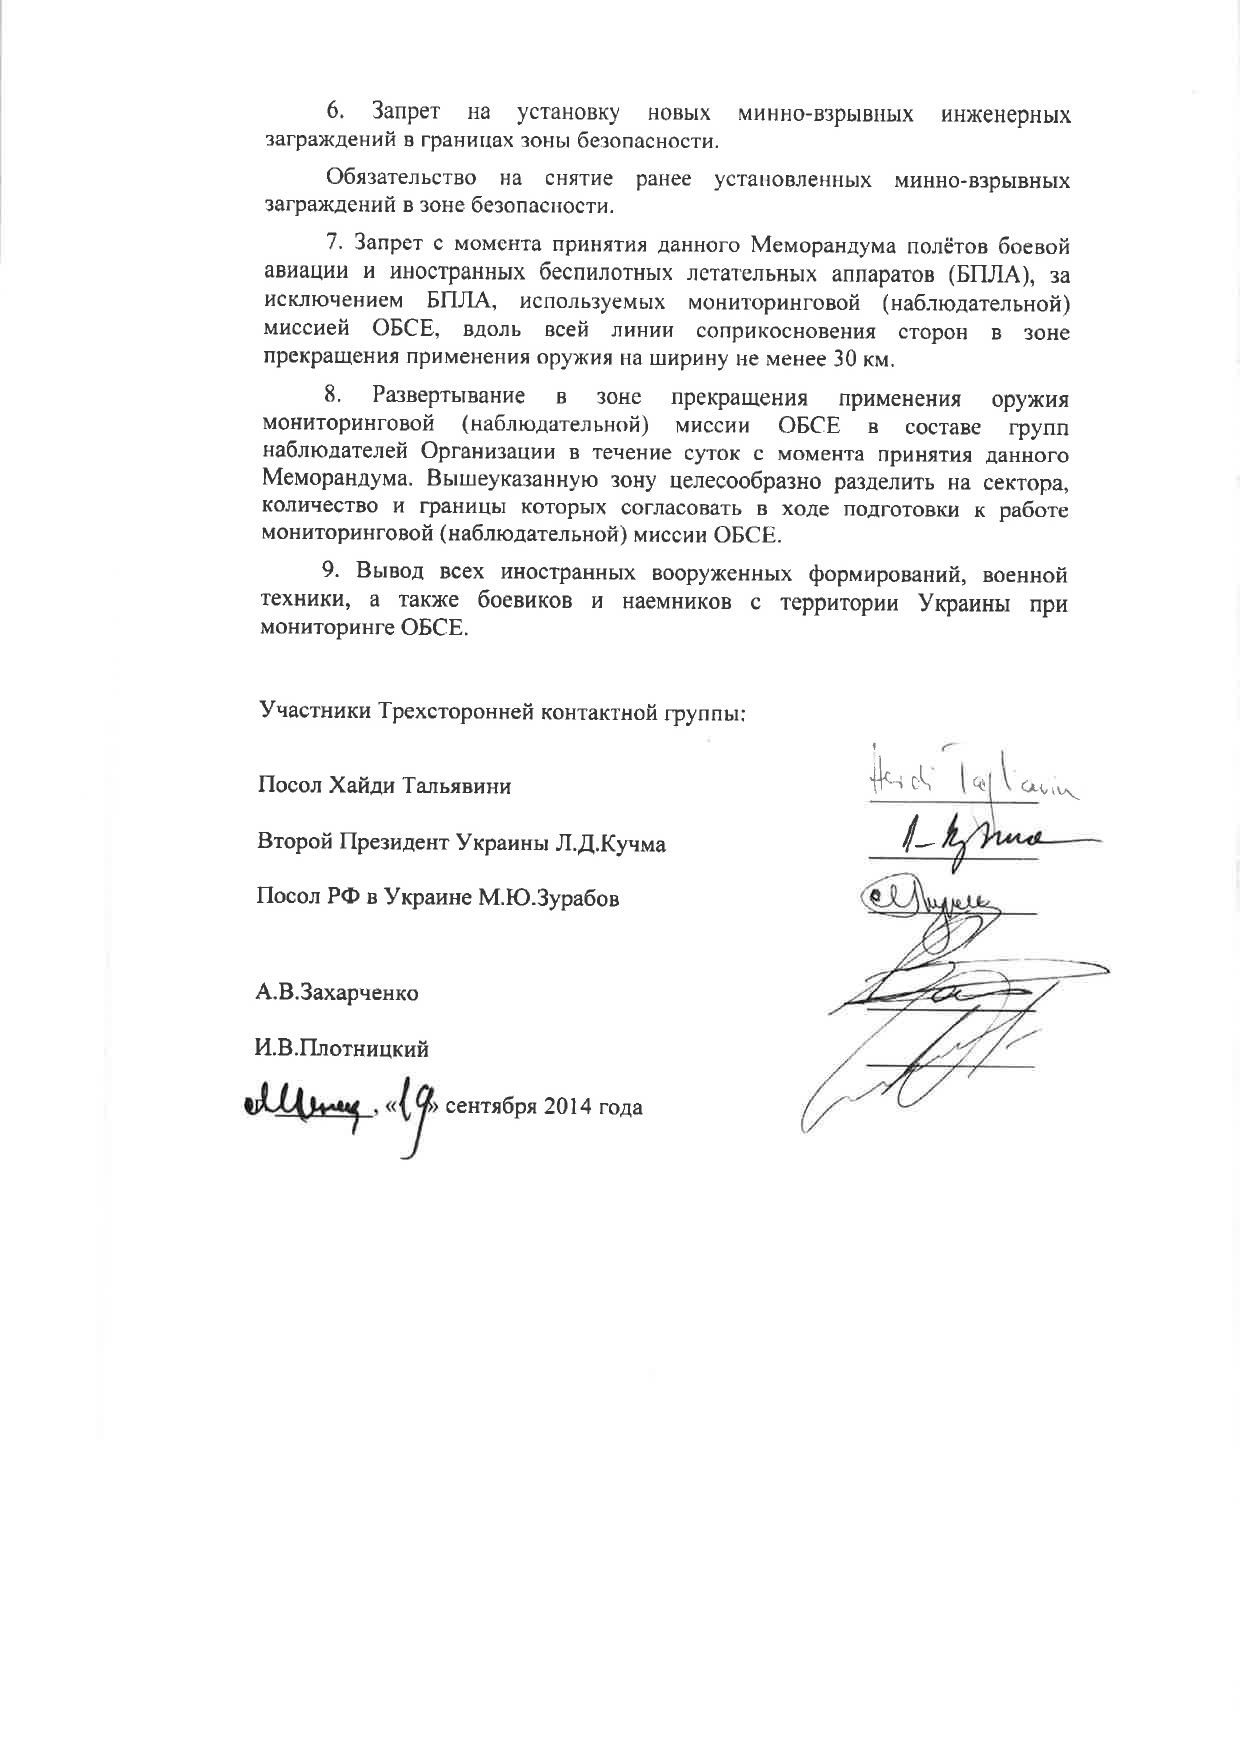 memorandum of the trilateral contact group minsk sept 19 2014